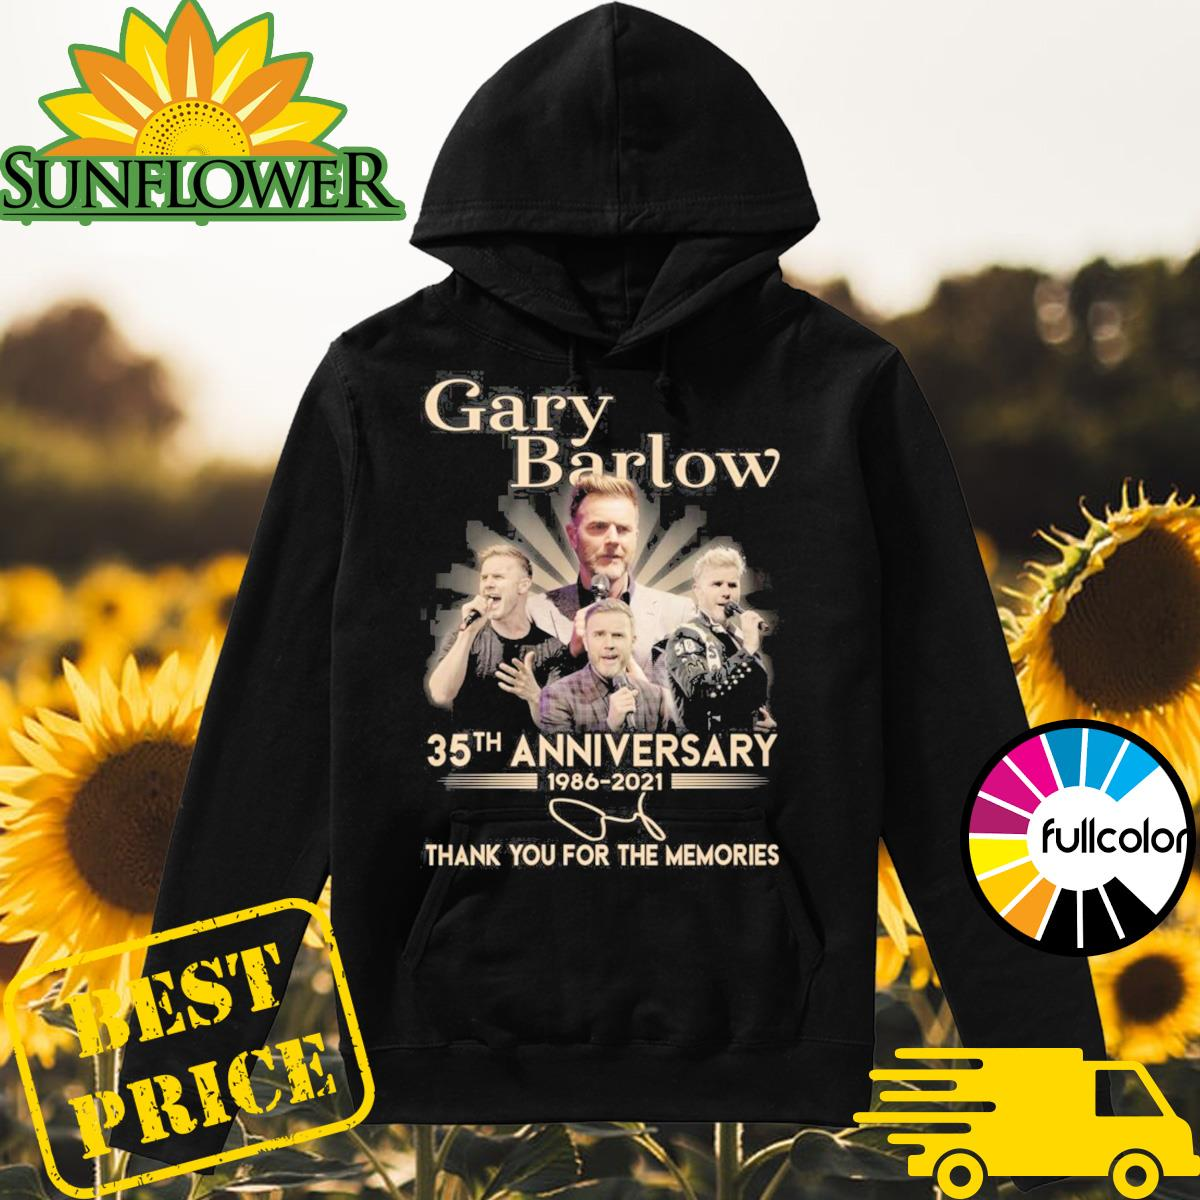 Gary Barlow 35th Anniversary 1986 2021 Signature Thank You For The Memories Shirt Hoodie